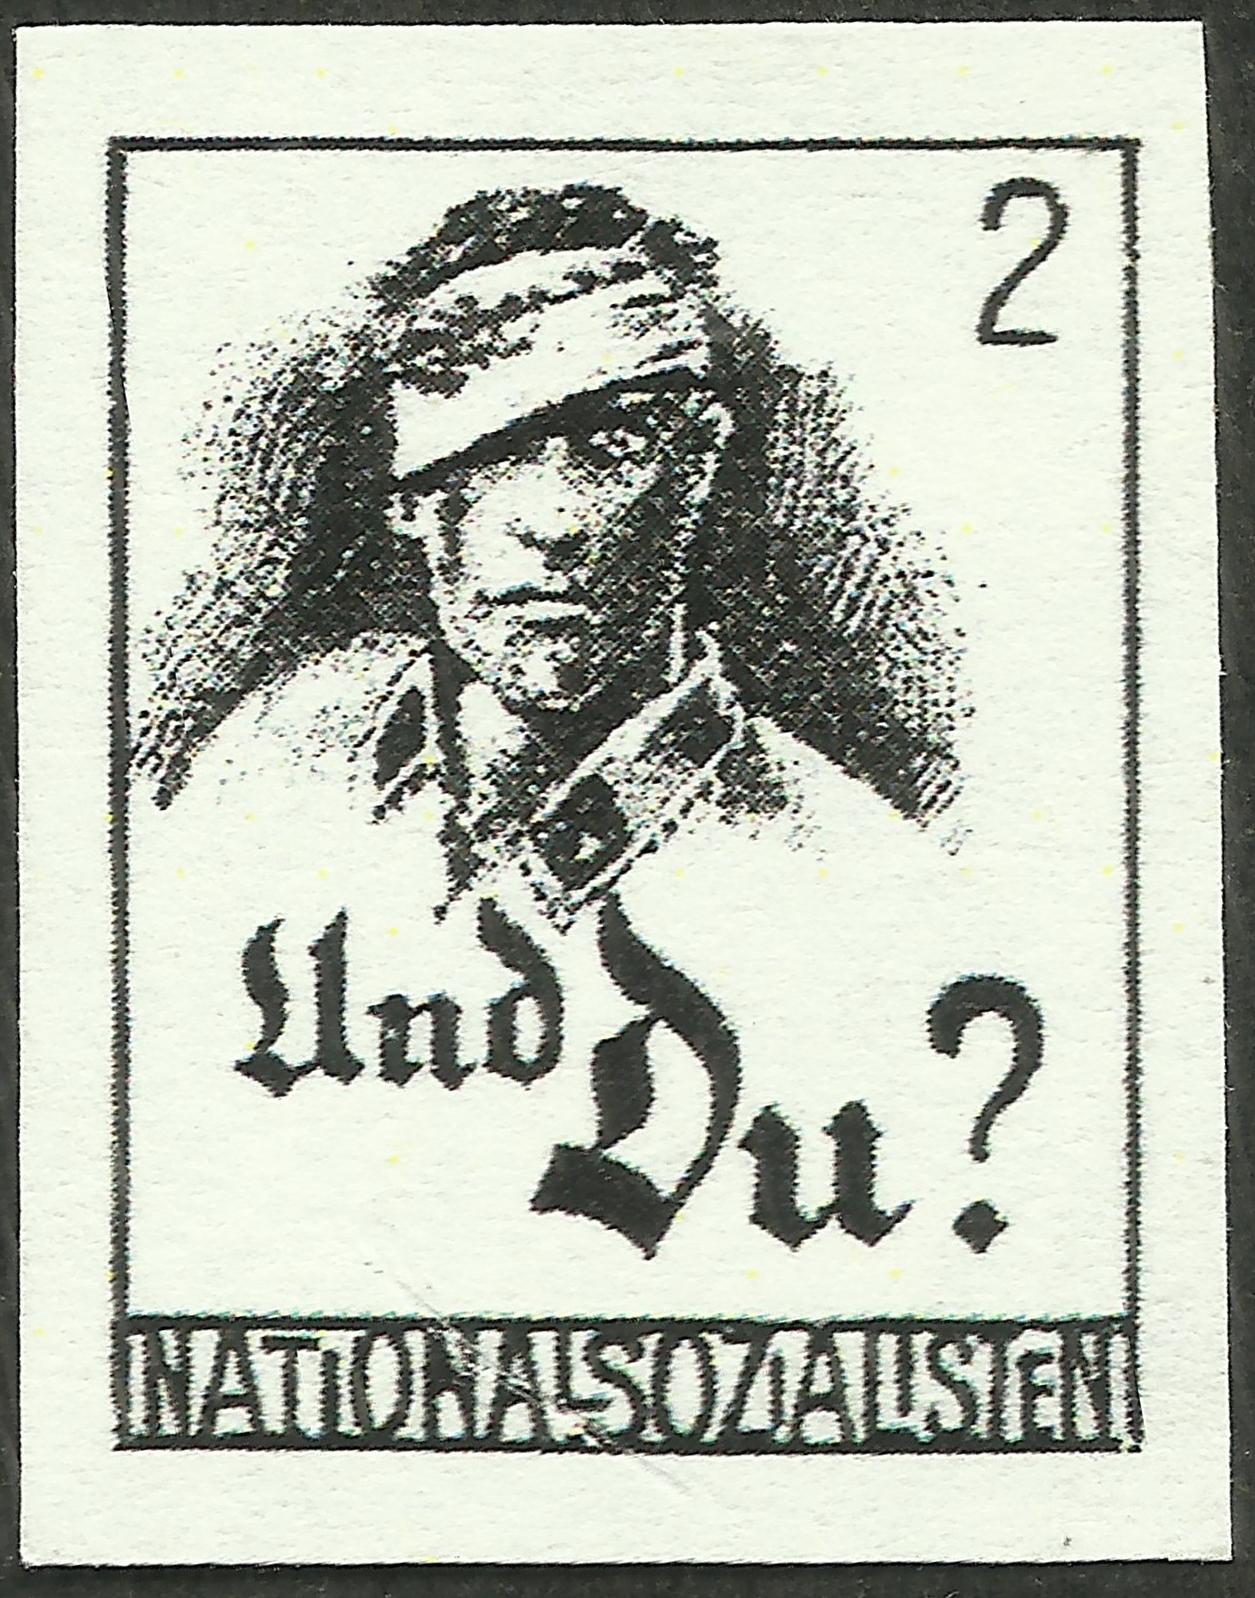 German propaganda stamp promoting National Socialism